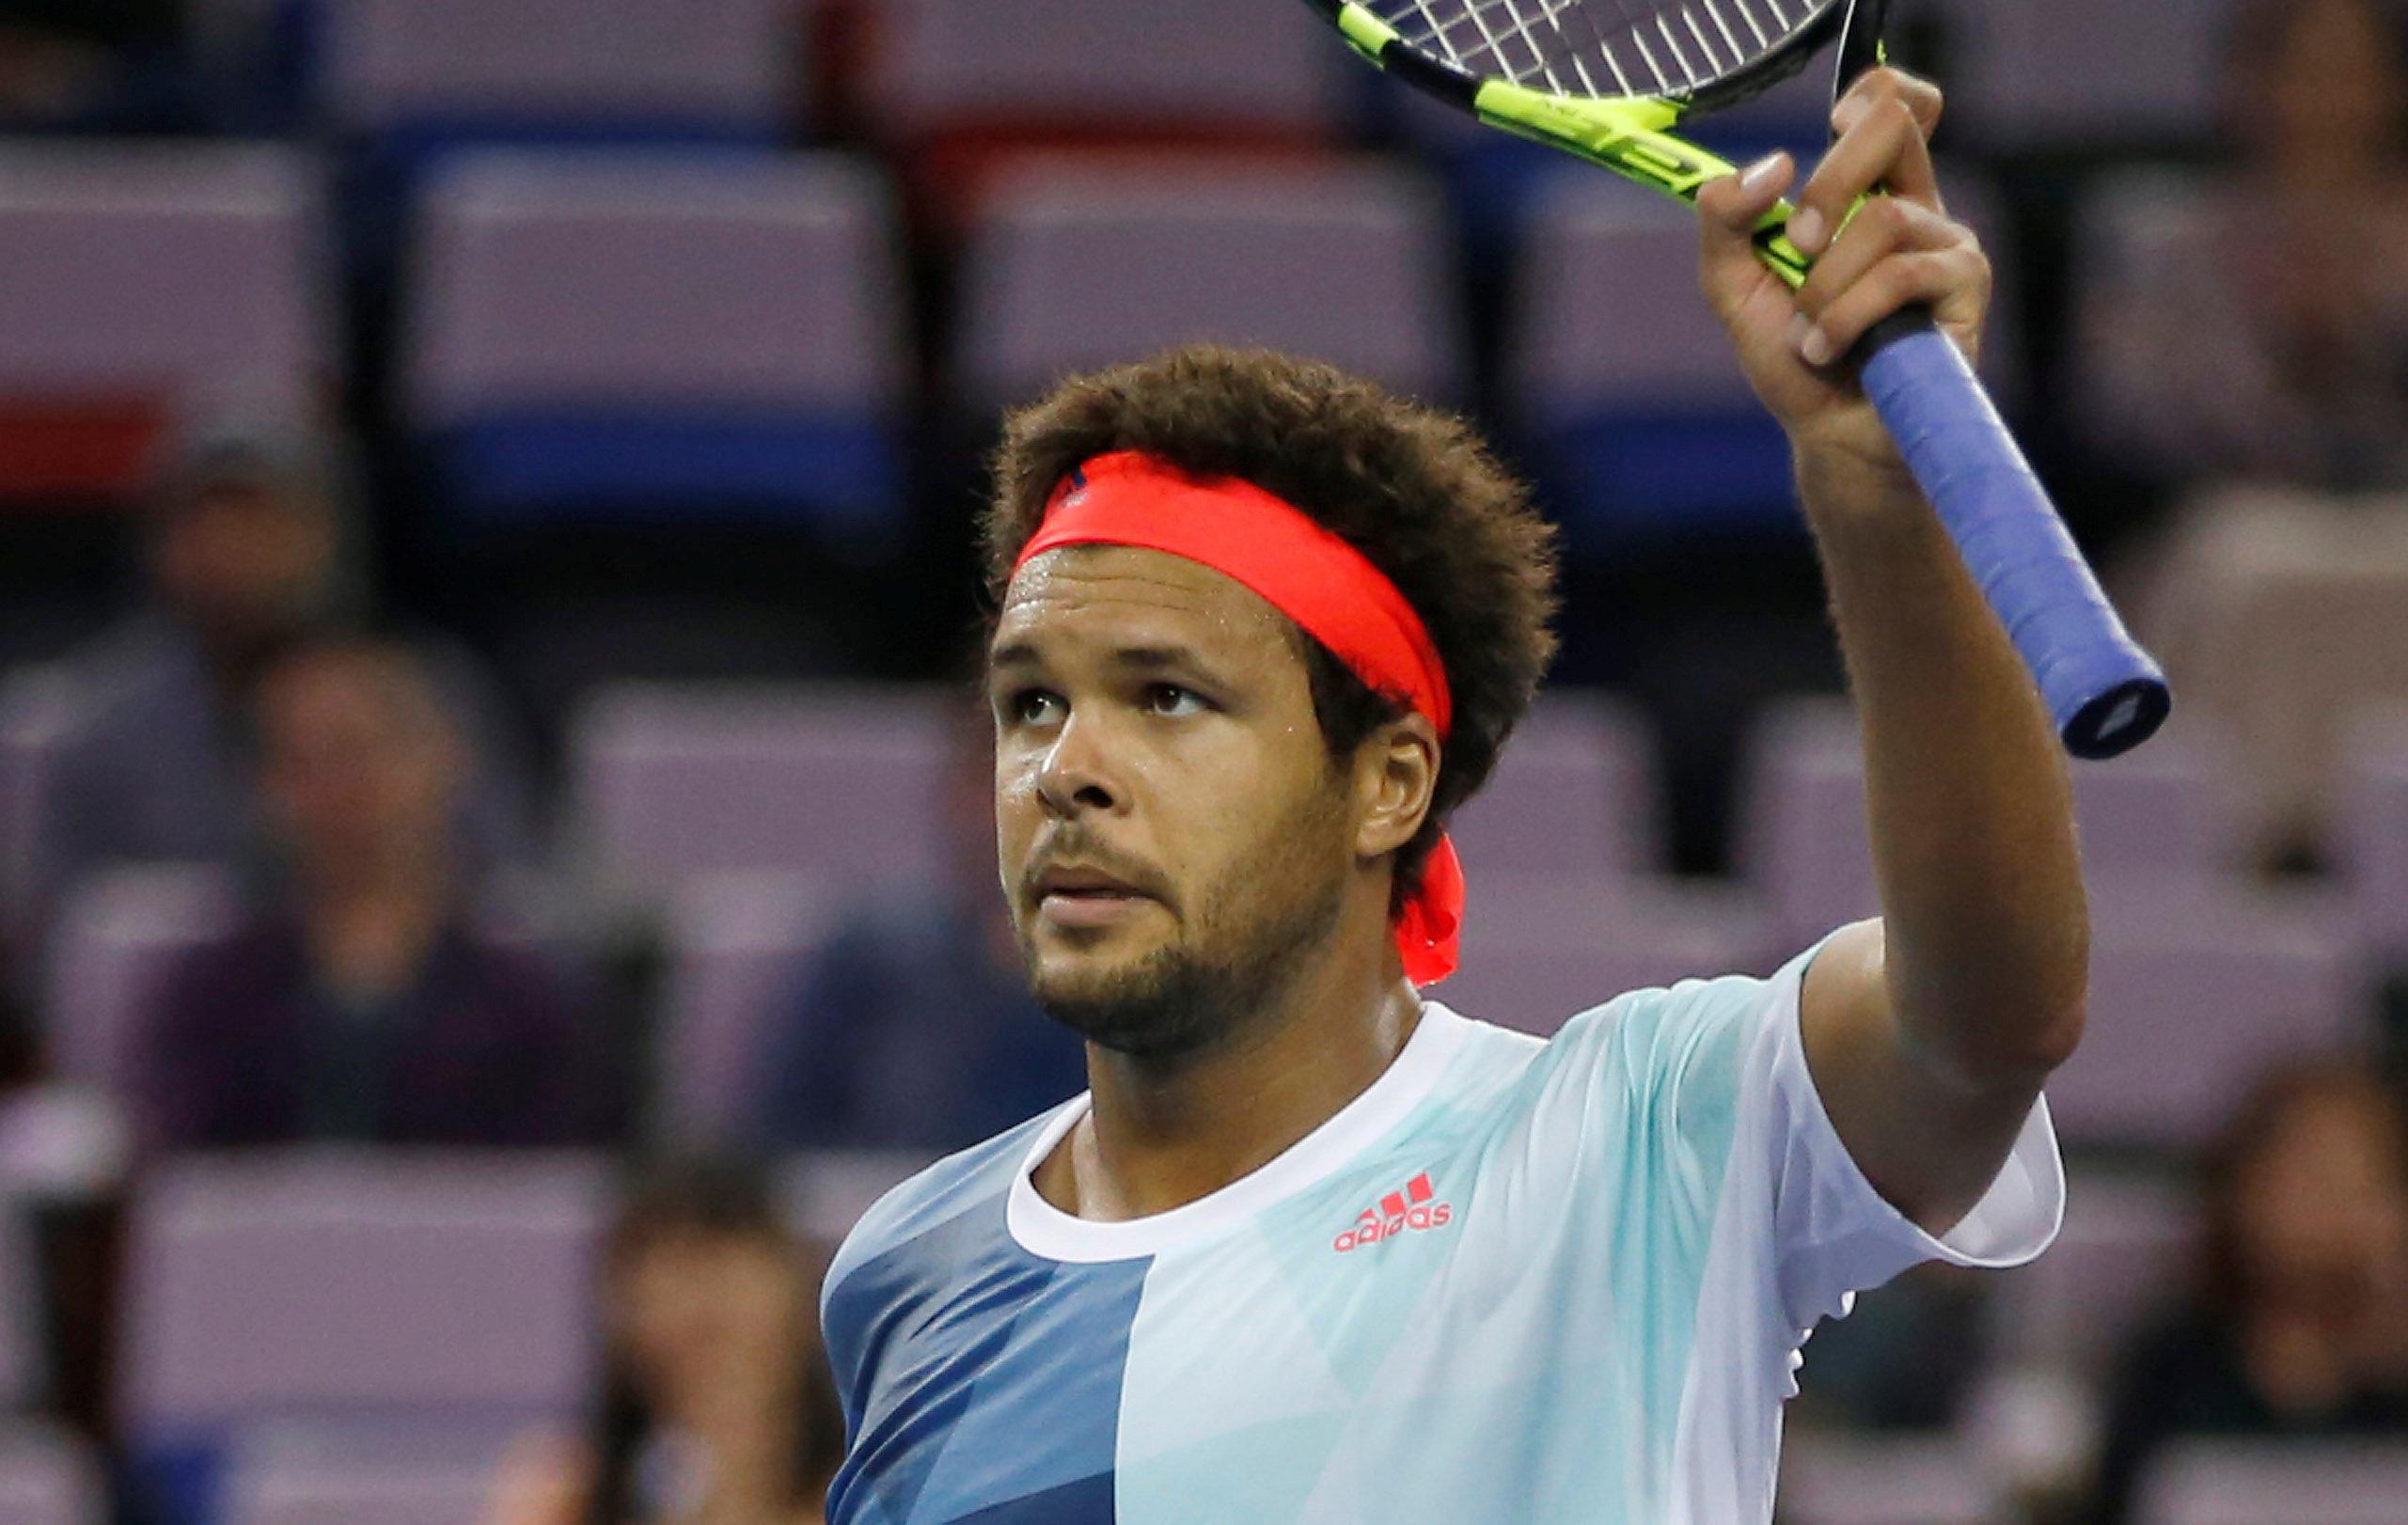 Tennis - ATP - Tsonga a bataillé face à Zverev